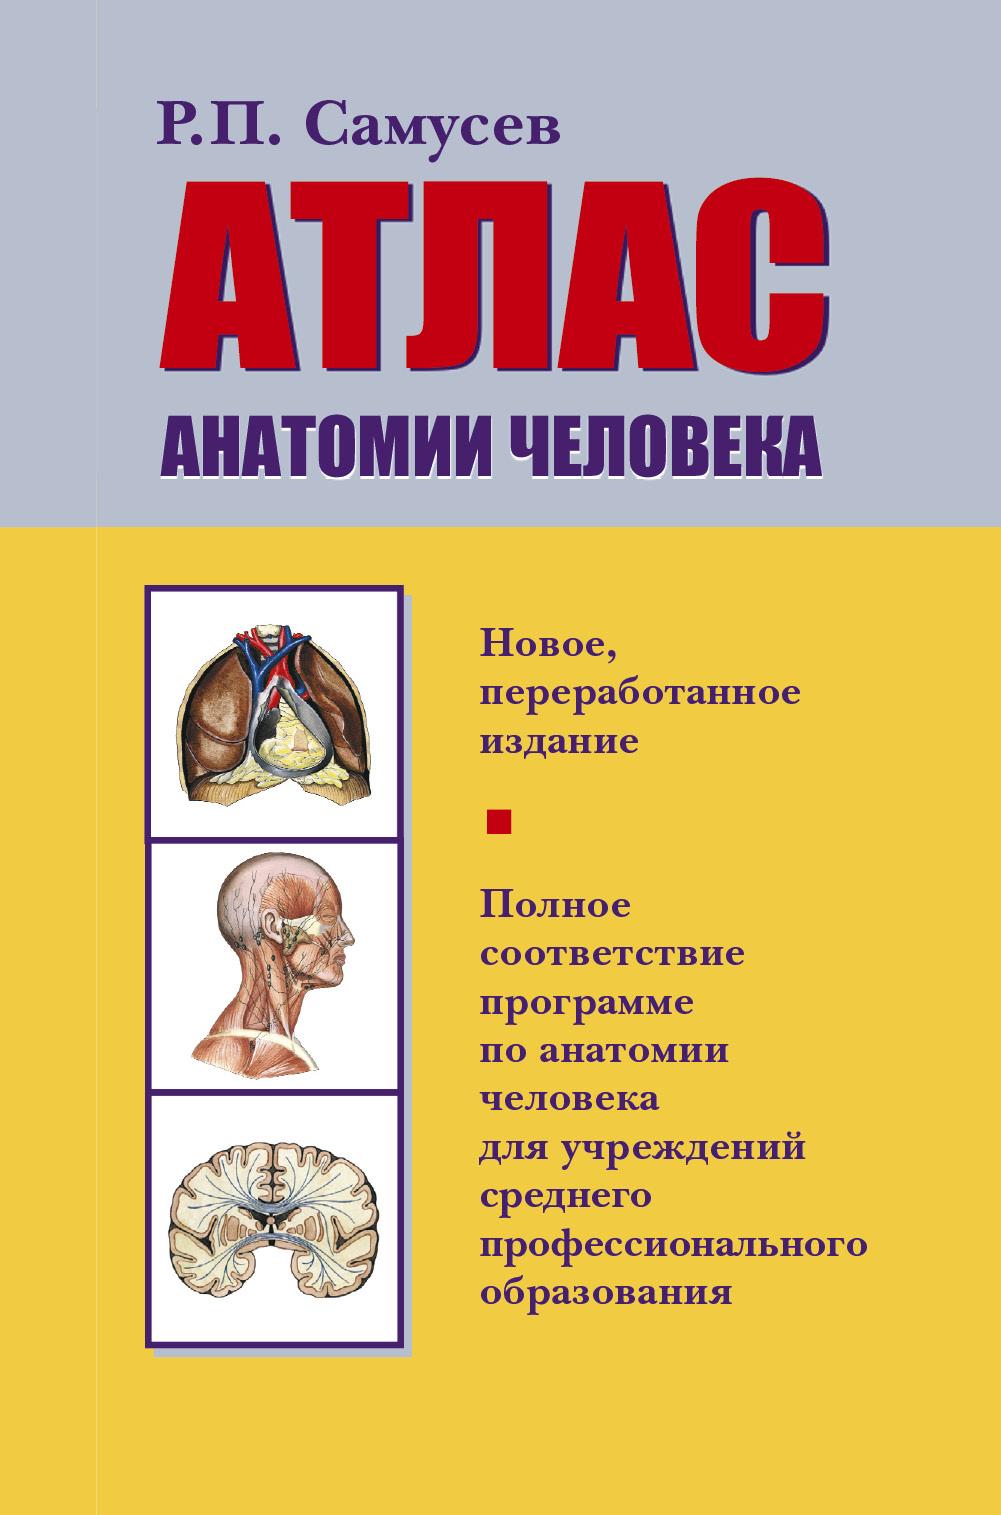 Атлас анатомии человека ( Самусев Р.П.  )